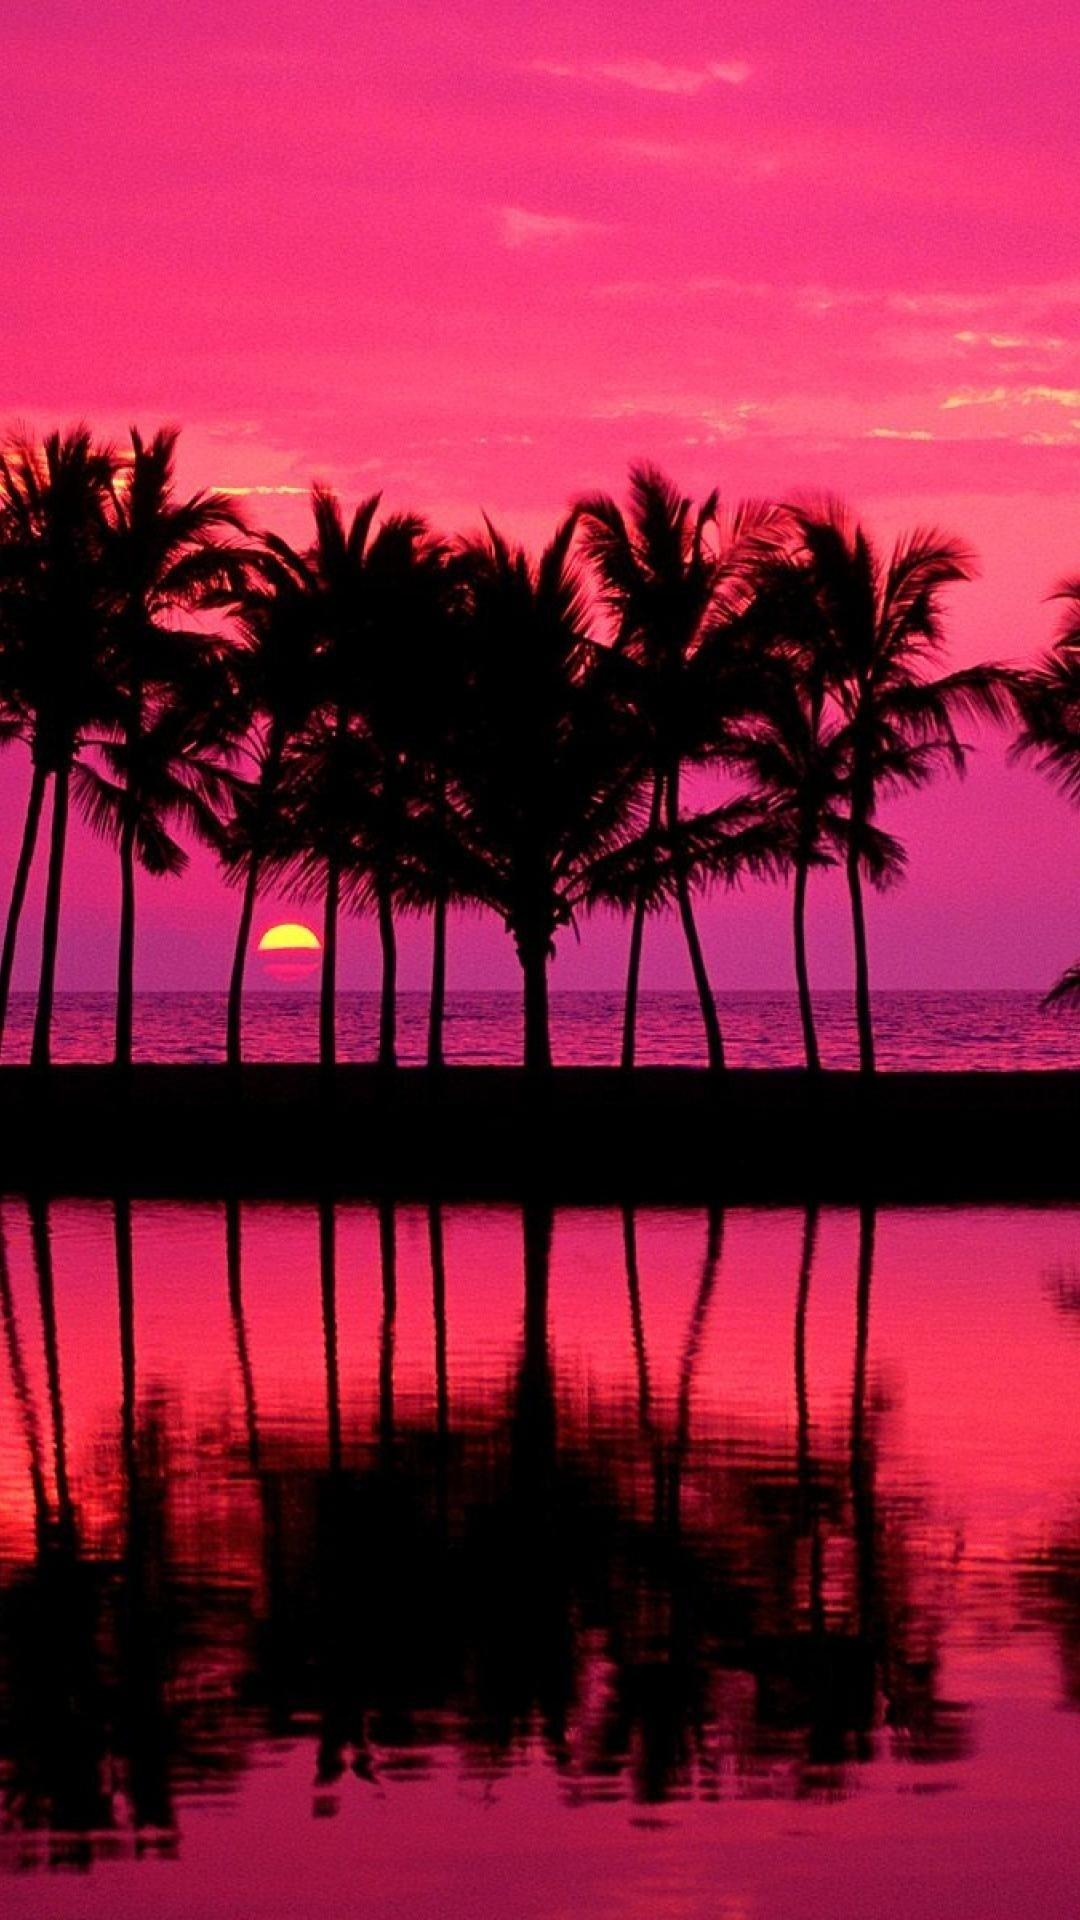 Tumblr Palm Trees Girly Pink Iphone Plus Wallpaper Tumblr Iphone .